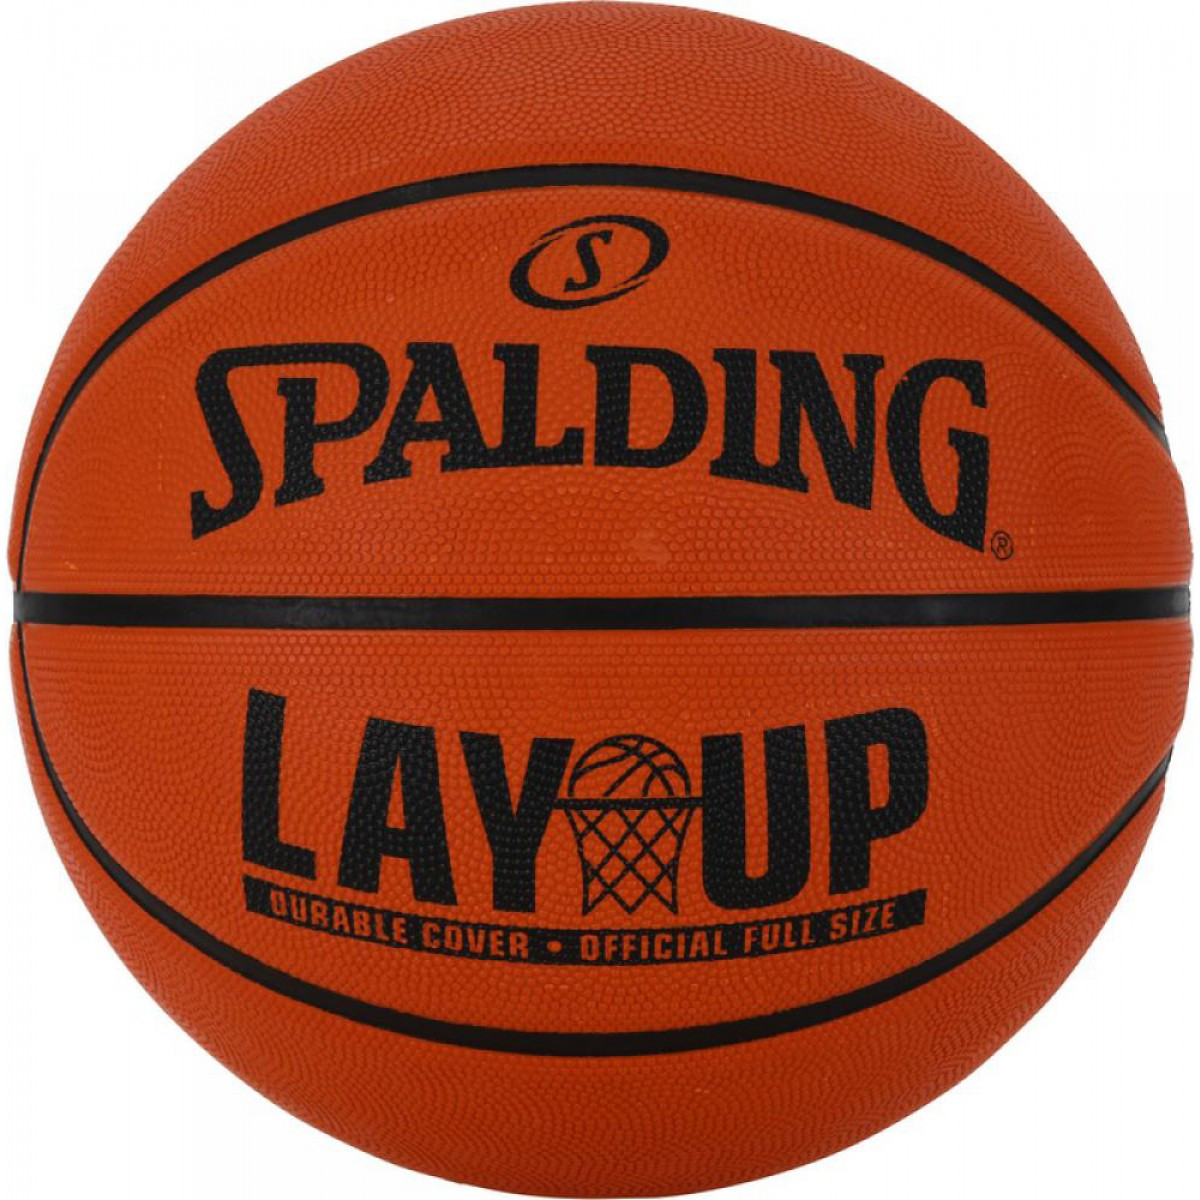 М'яч баскетбольний Spalding LayUp Size 7